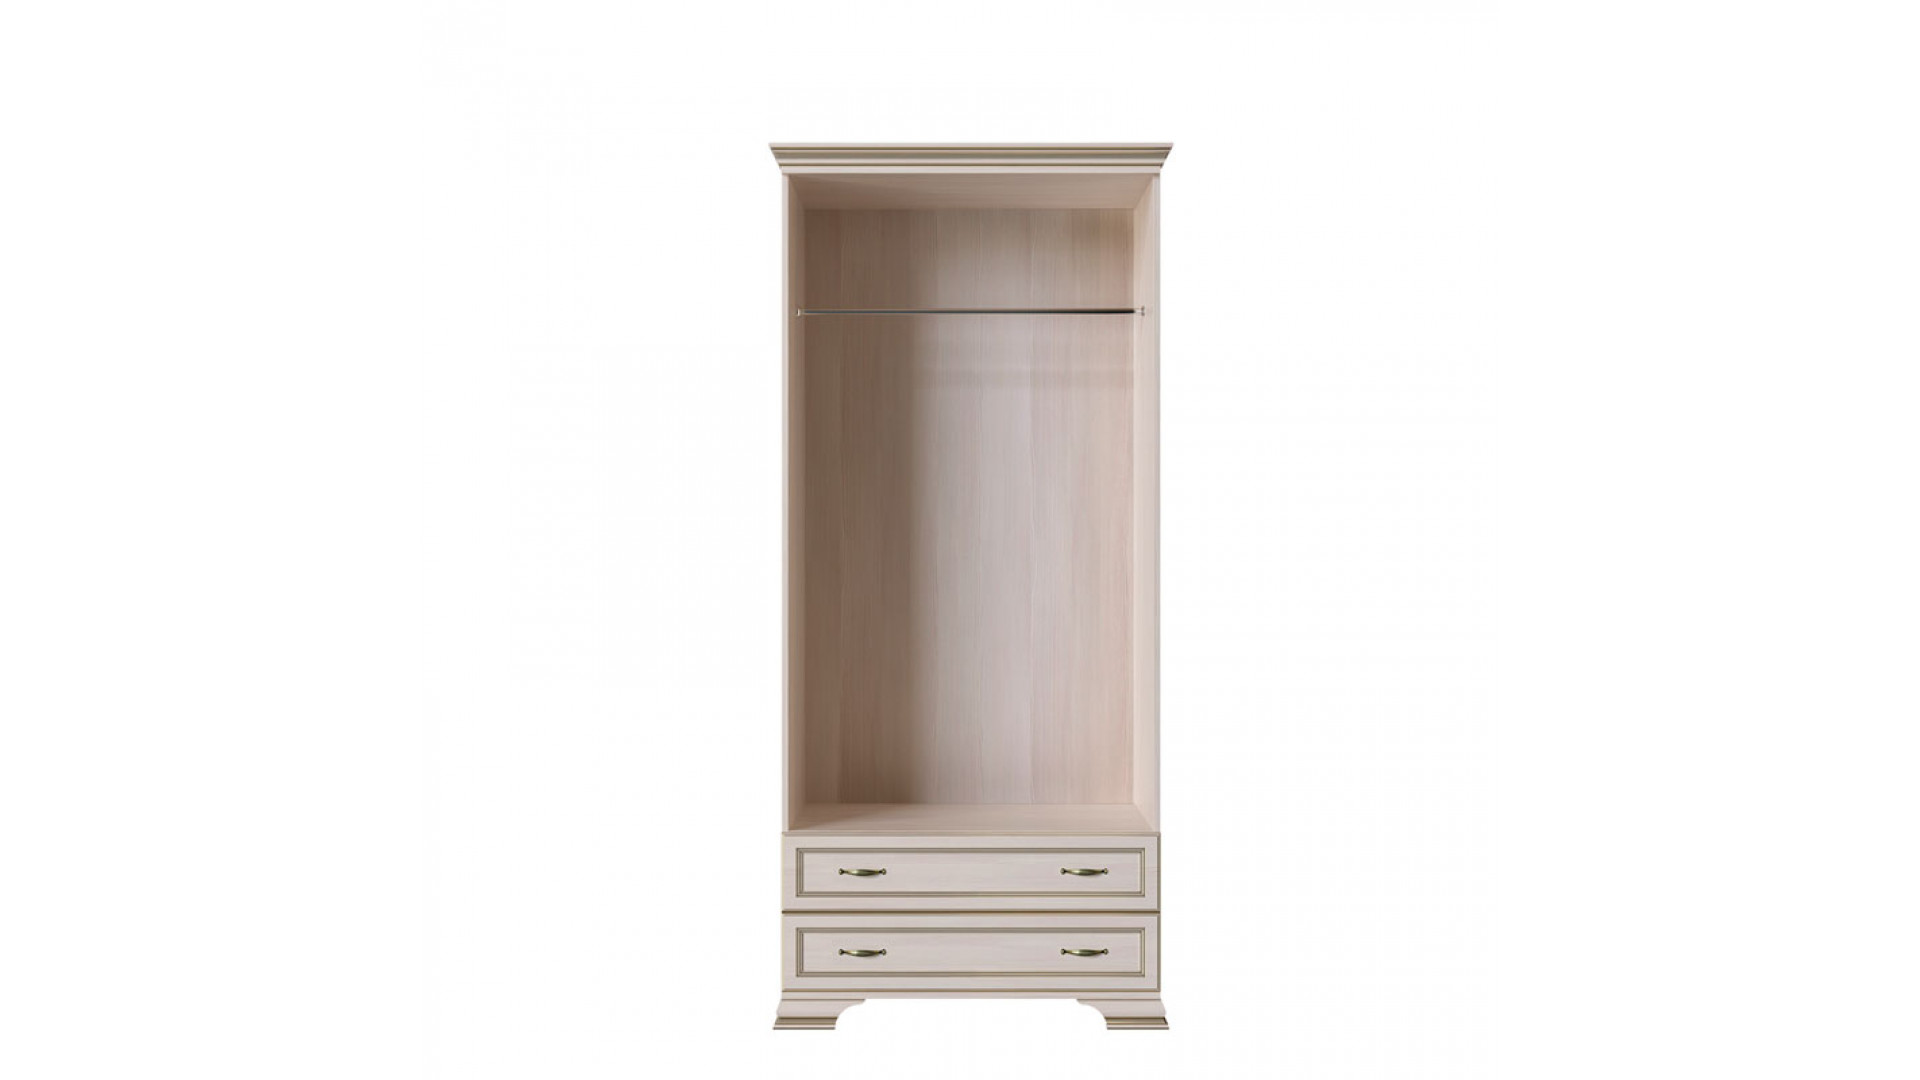 шкаф 2-х дверный (корпус) Кураж Сиена